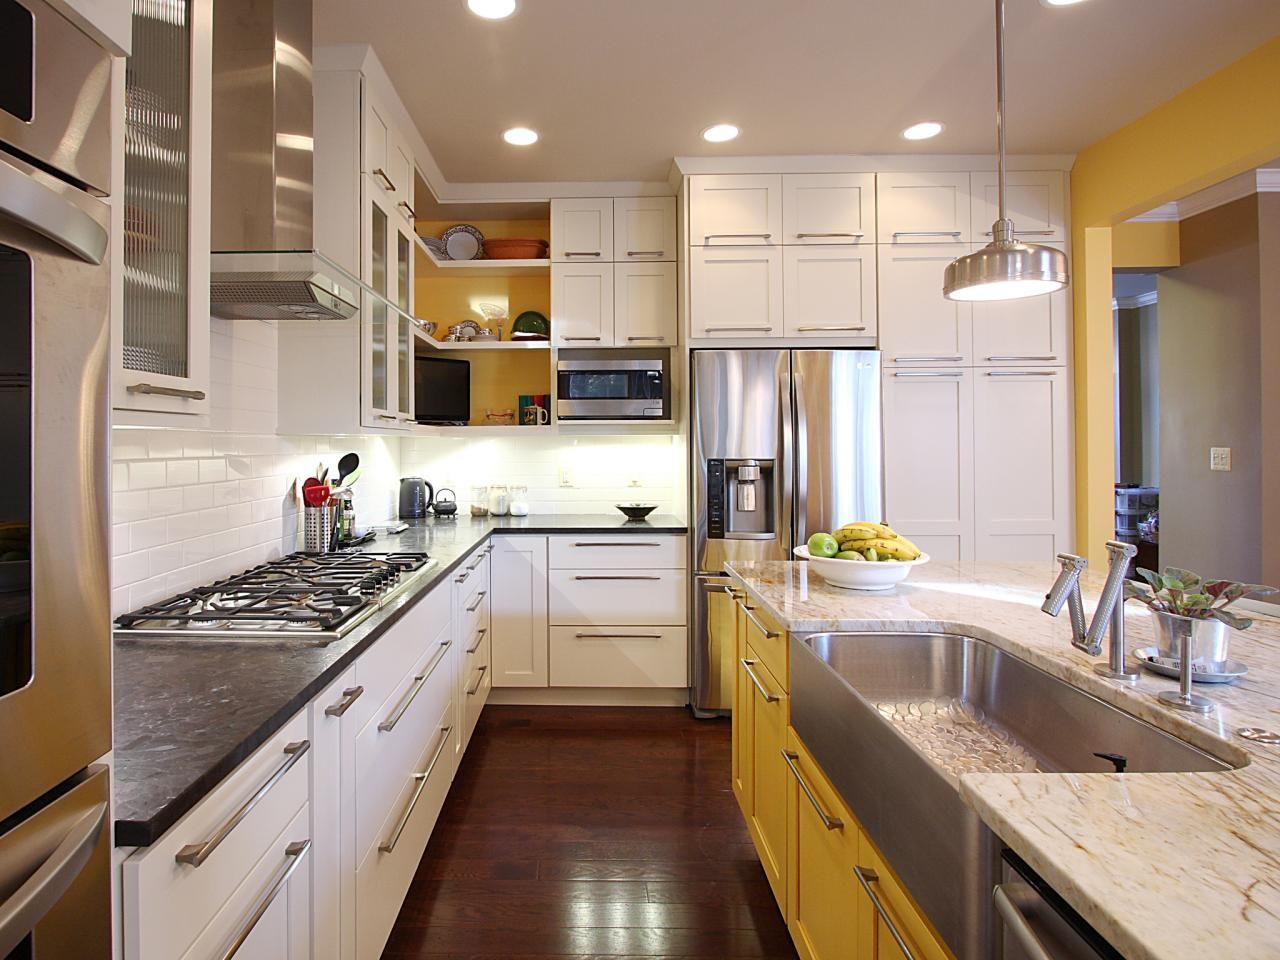 Modern Design Kitchen Cabinet Doors Hgtv Pictures Ideas Painting Kitchen Cabinets Kitchen Cabinet Colors Contemporary Kitchen